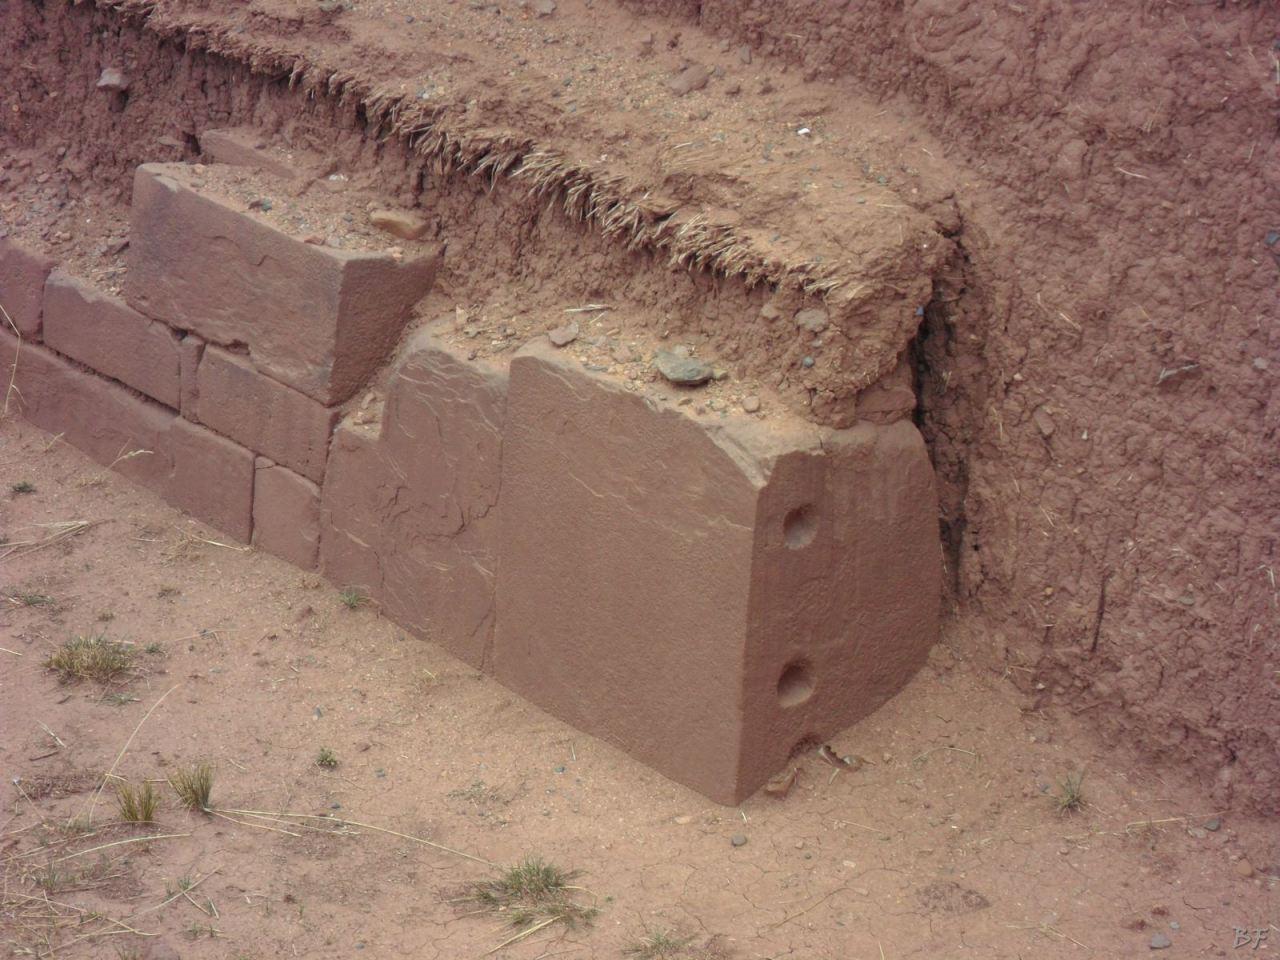 Sito-Megalitico-Piramide-Akapana-Kalasasaya-Menhir-Tiahuanaco-Bolivia-124